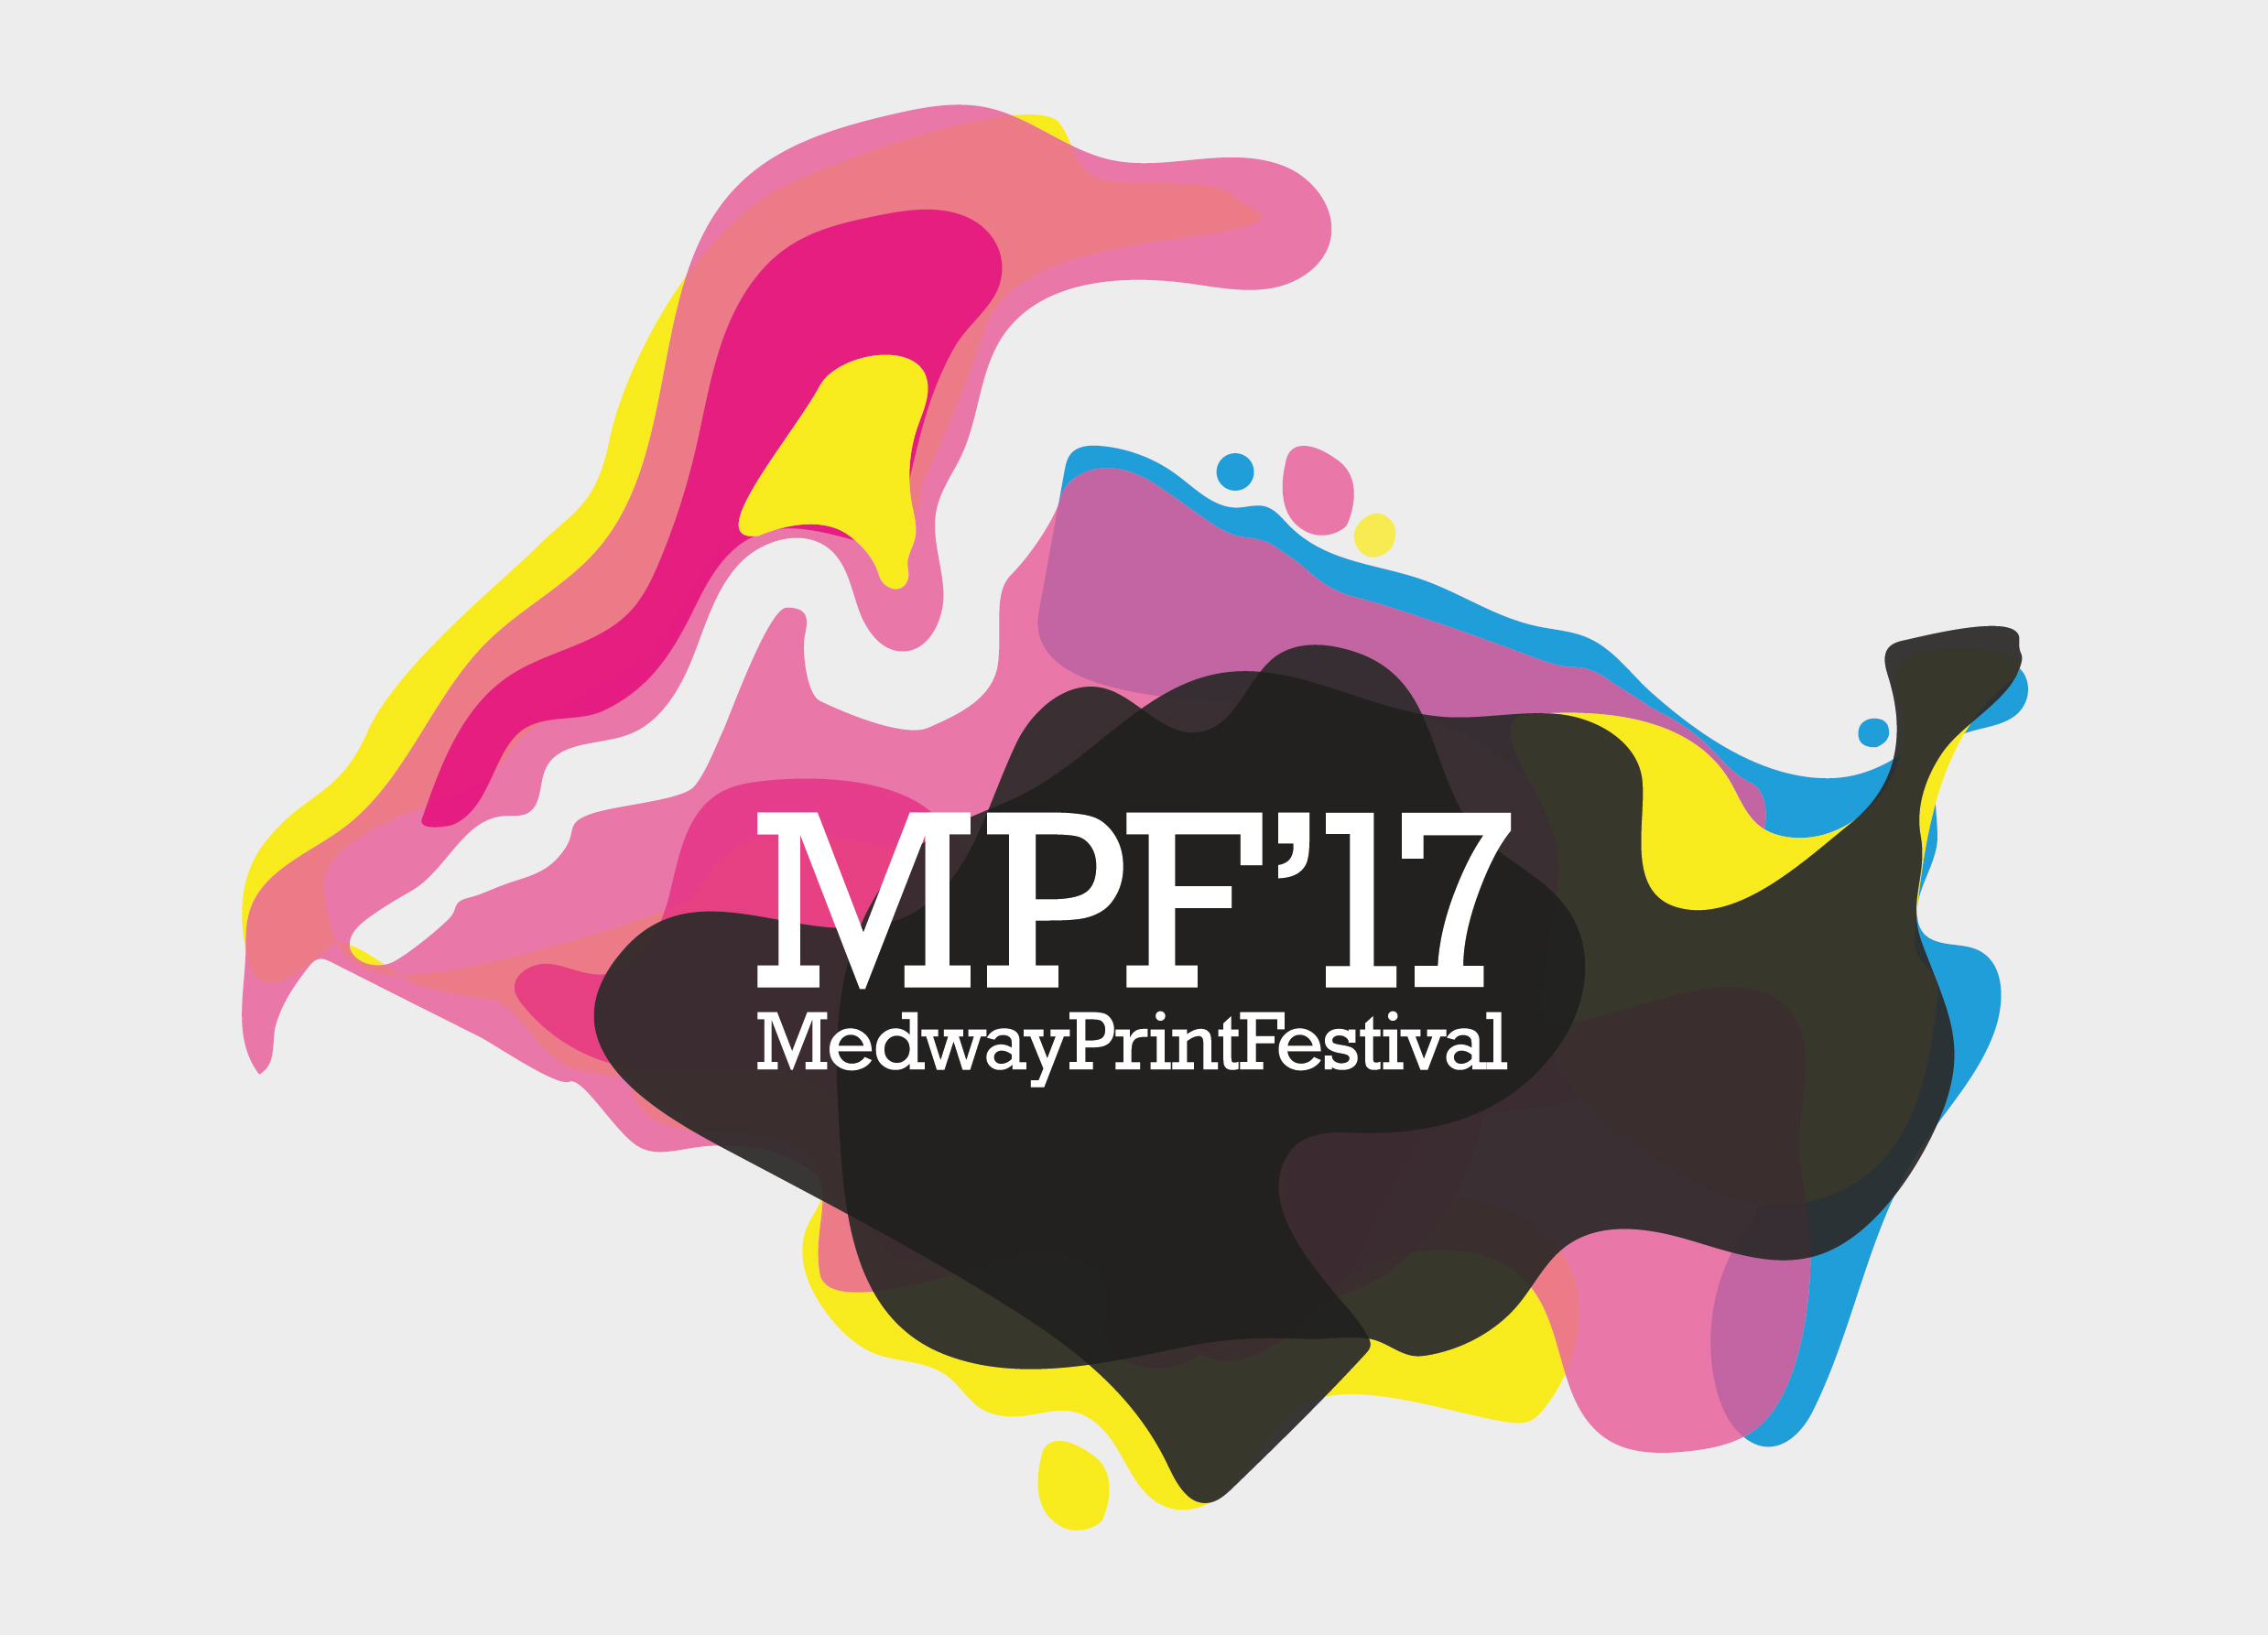 MPF17 CMYK